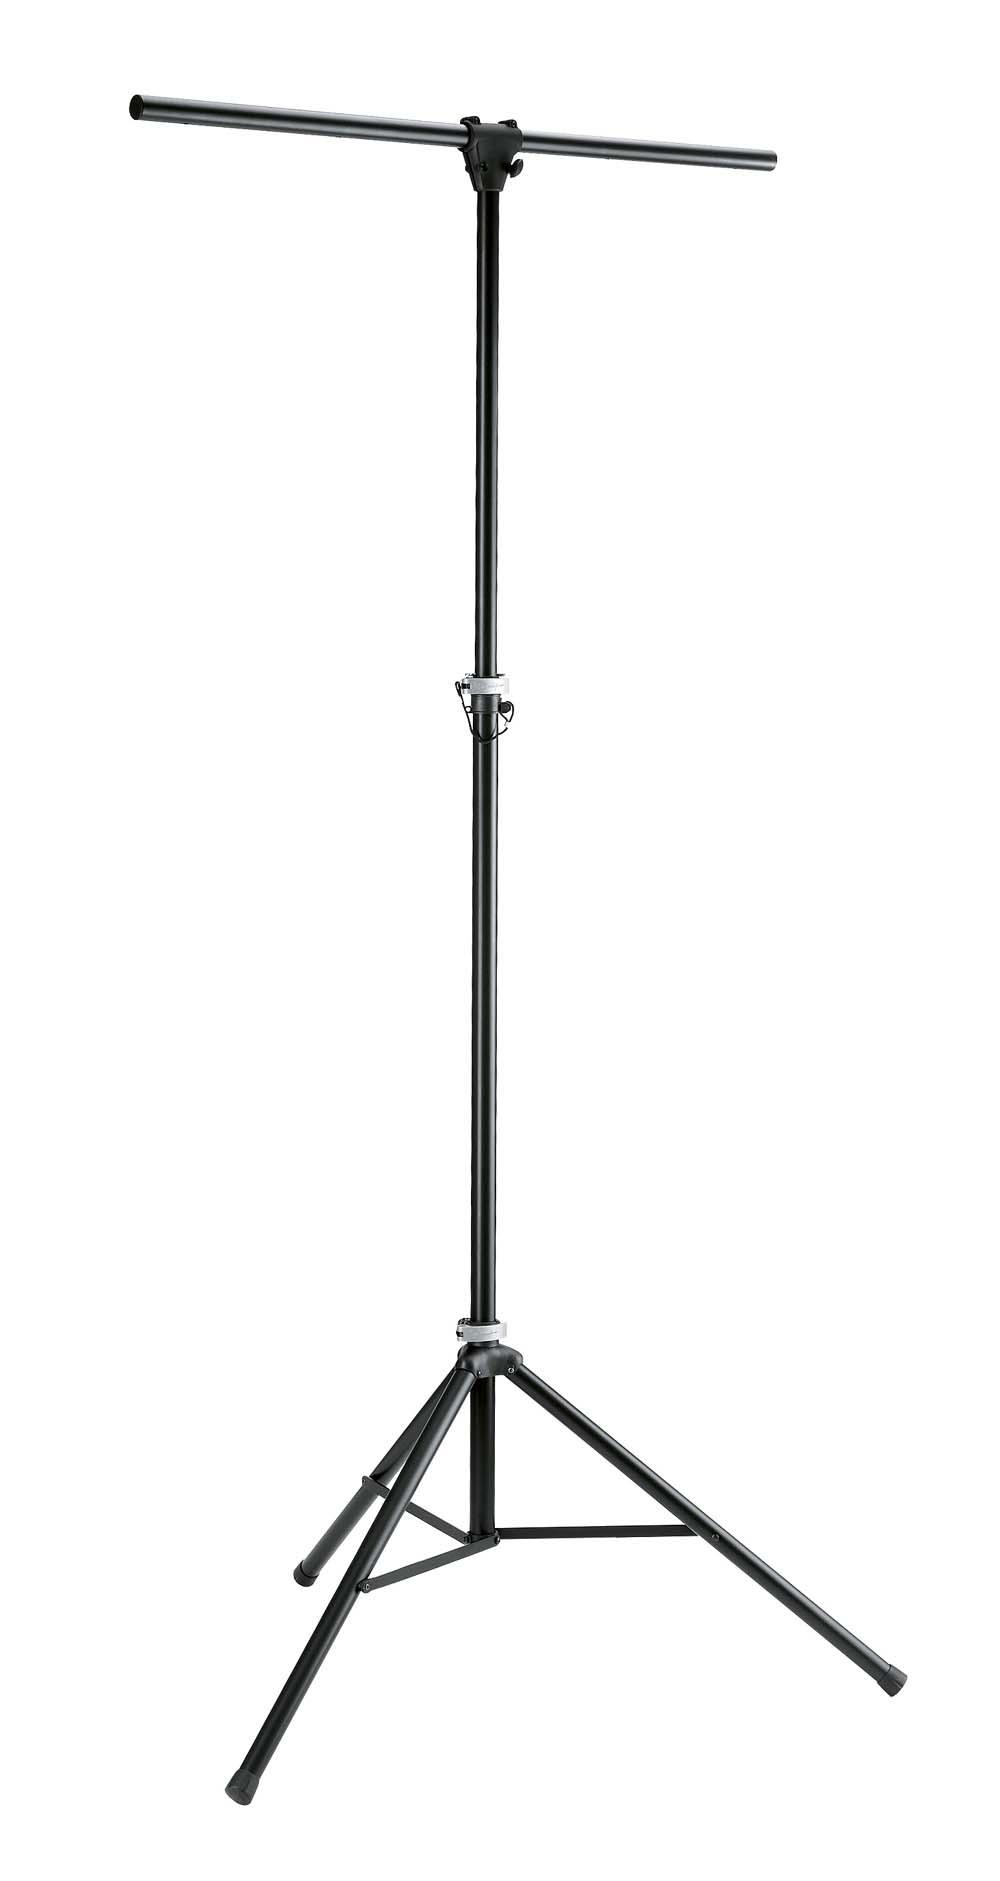 KM 24620 Lighting stand with cross bar